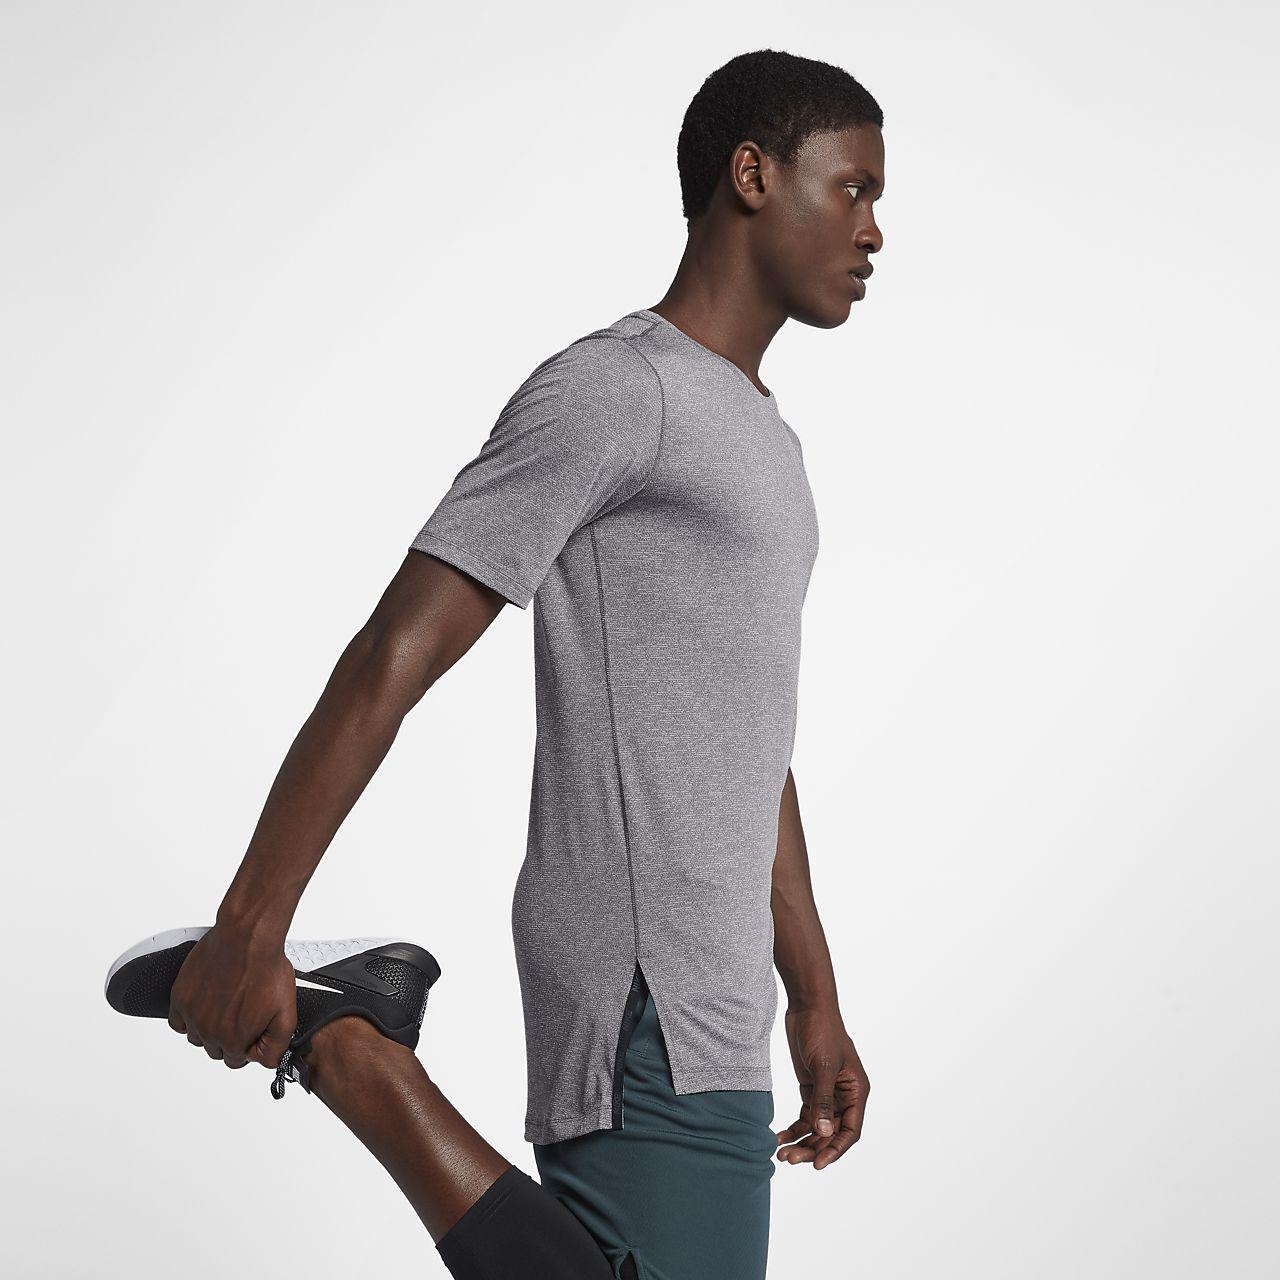 5952ff6097 Nike Dri-FIT Men s Utility Short-Sleeve Training Top. Nike.com